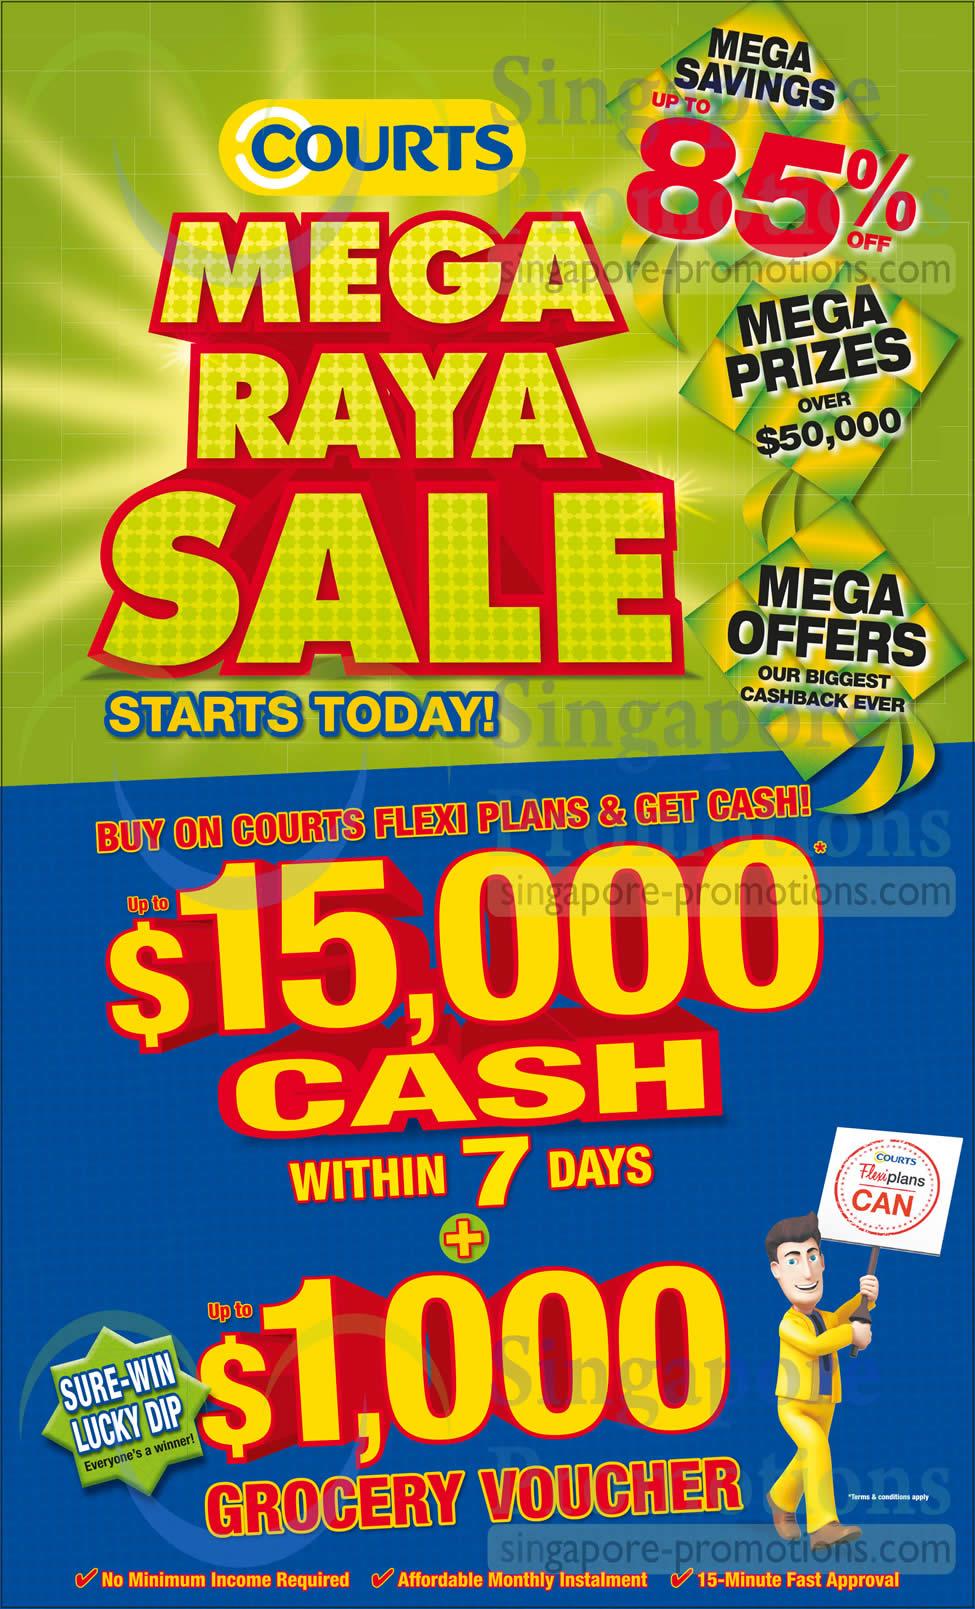 Courts Mega Raya Sale, Savings Up To 85 Percent